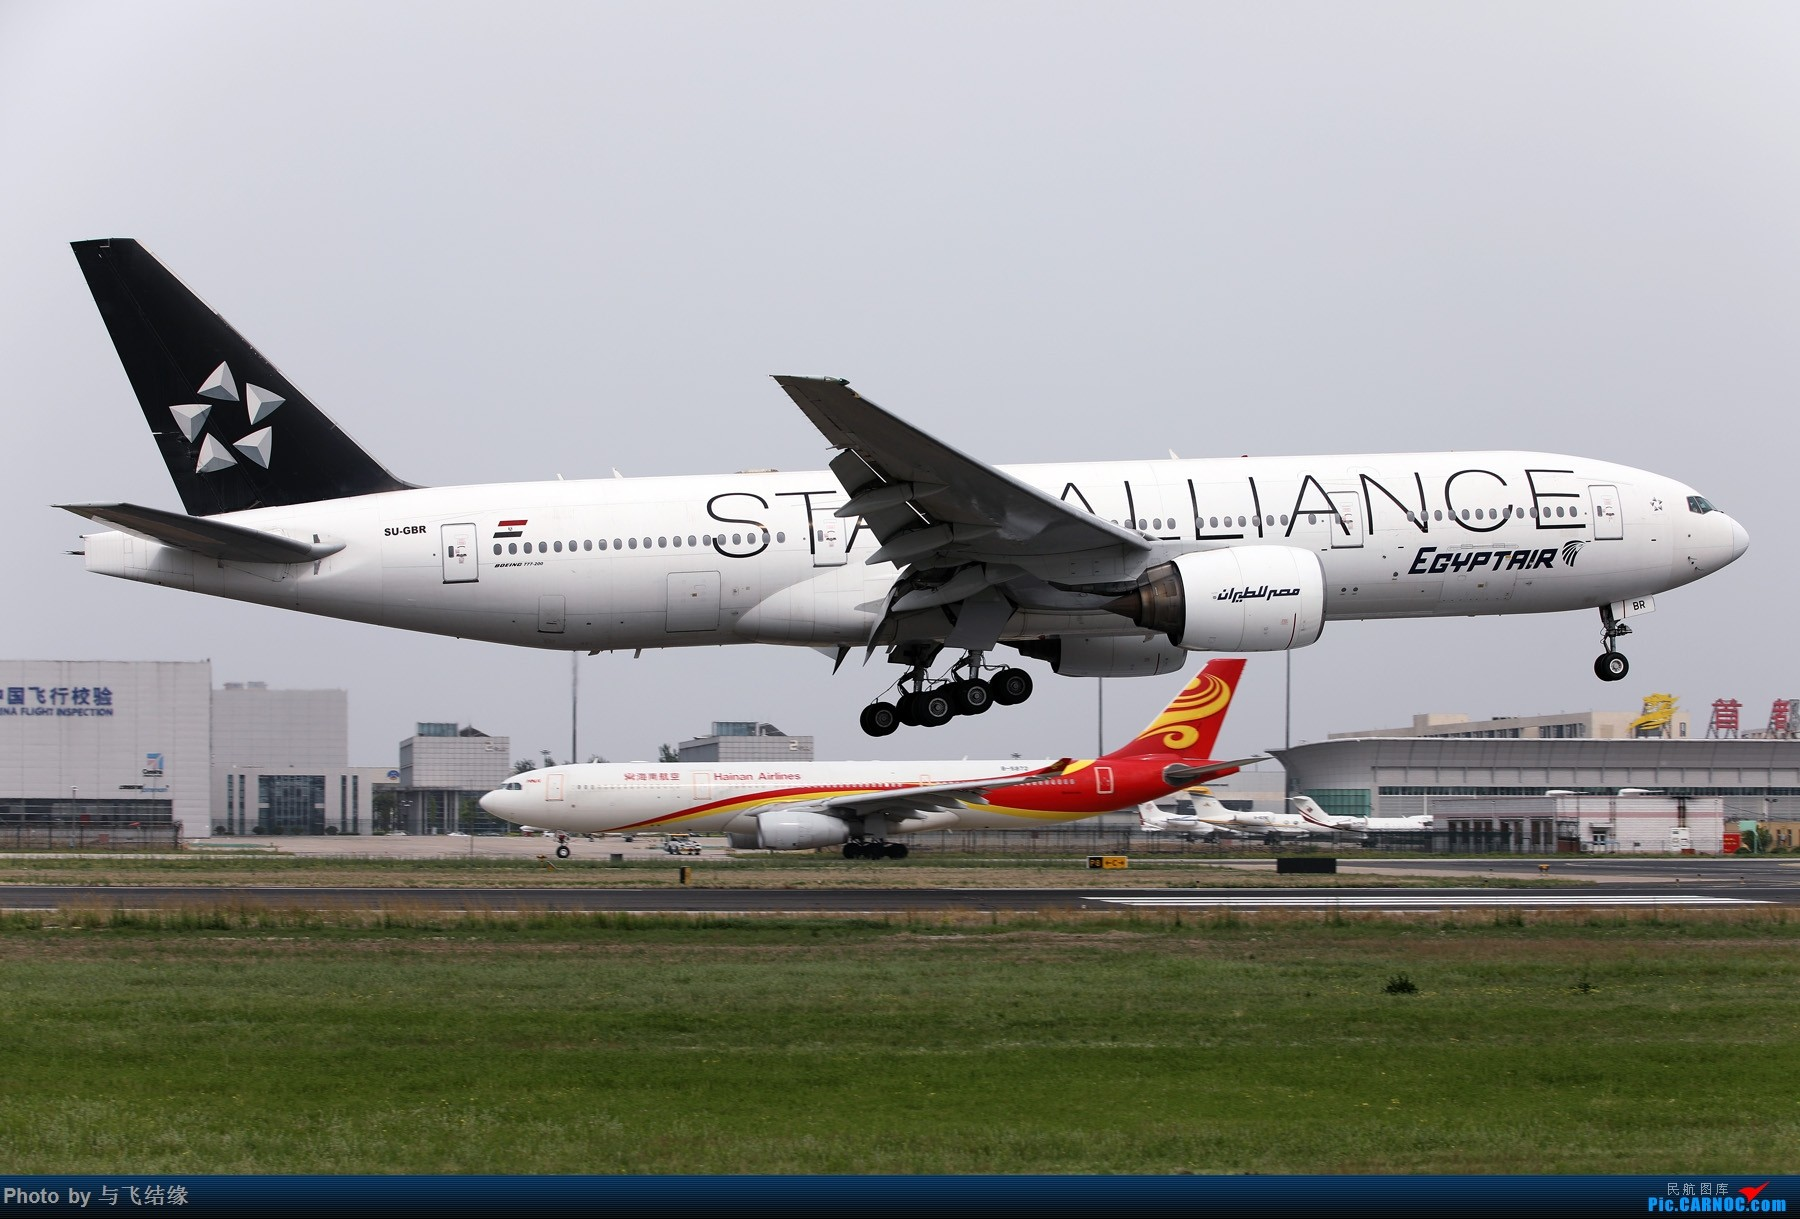 Re:[原创]埃及航空星空联盟涂装Boeing 777-200ER. BOEING 777-200ER SU-GBR 中国北京首都国际机场